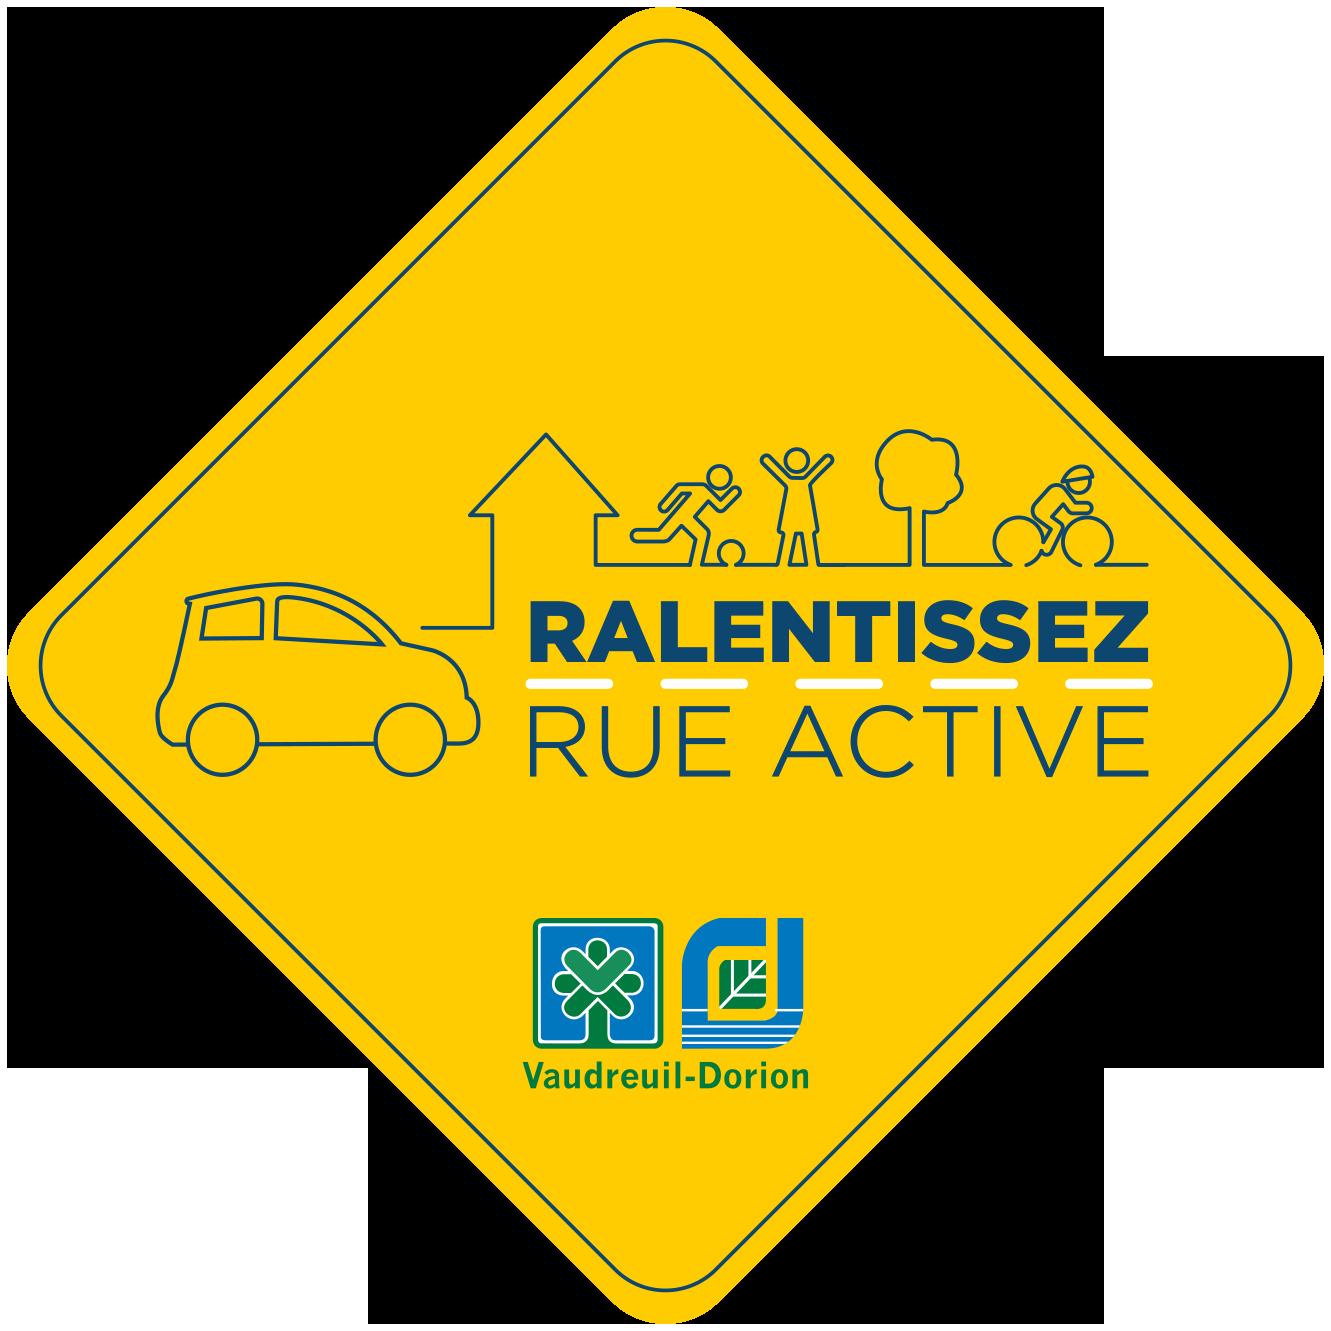 Logo-rue-active.png (124 KB)